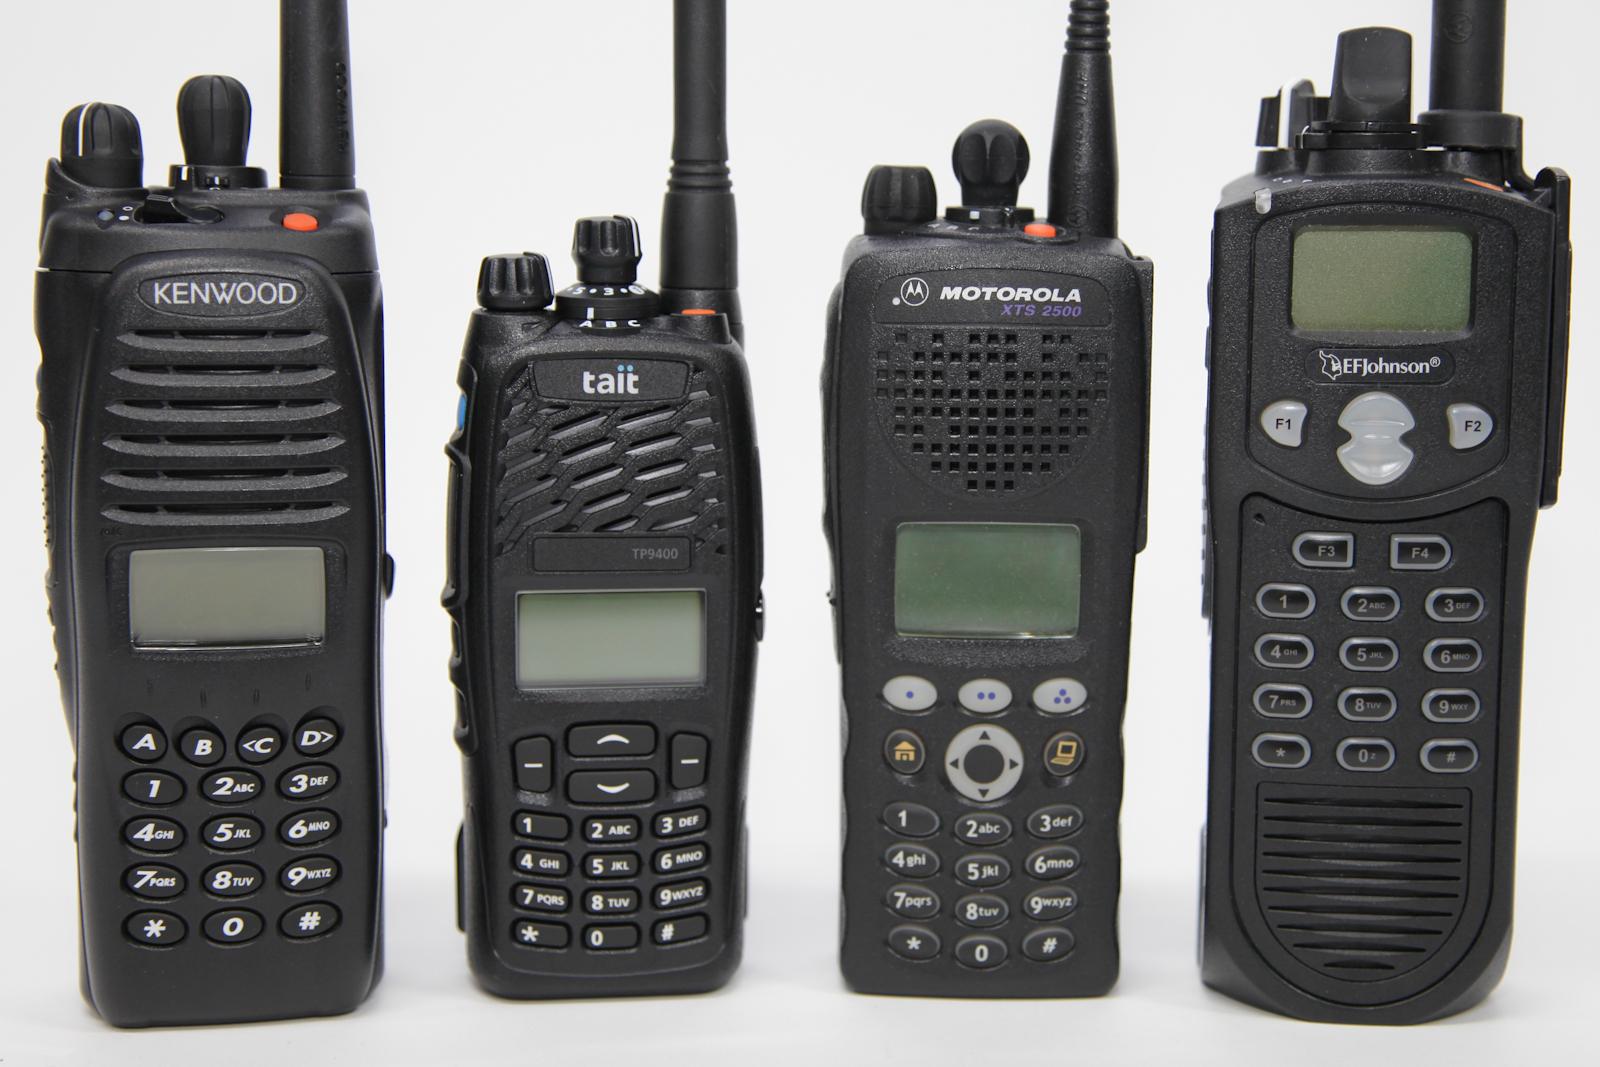 Vhf Portable Radios likewise mscope besides Mobile antennas likewise Motorola Wireless Walkie Talkie moreover 129744703. on two way radios manufacturers